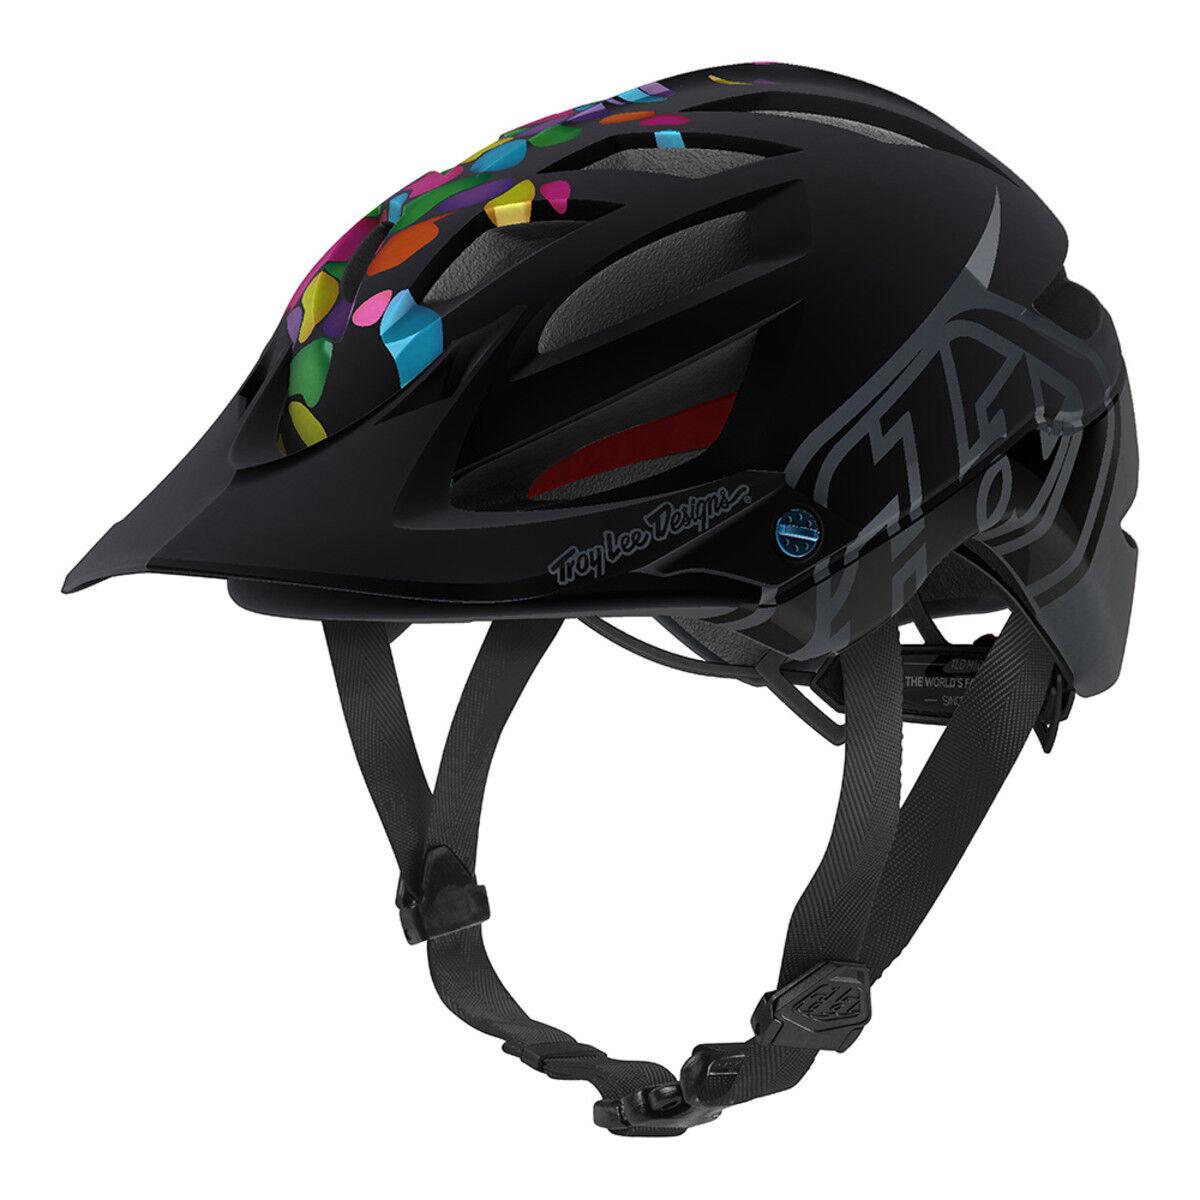 2018 Tld Troy Lee Designs Jugend A1 Multi-Einfluss Jelly Bean Mountainbike Helm